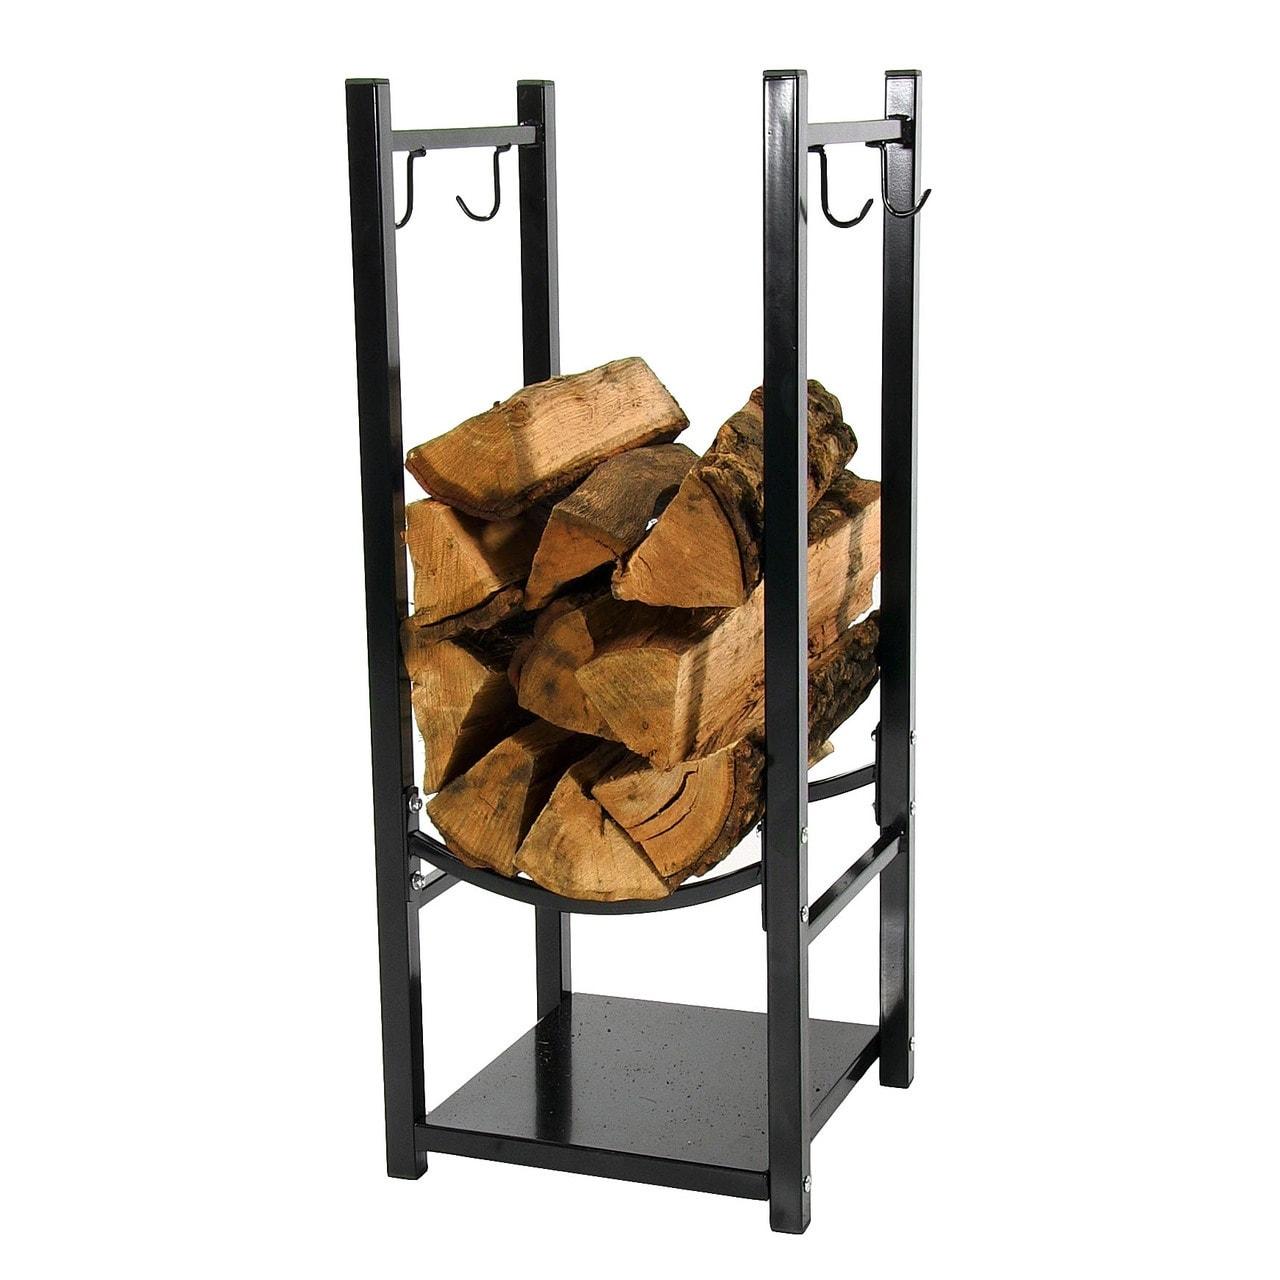 Wood Storage  Organization Store Shop The Best Deals For Sep - Wide bookshelves